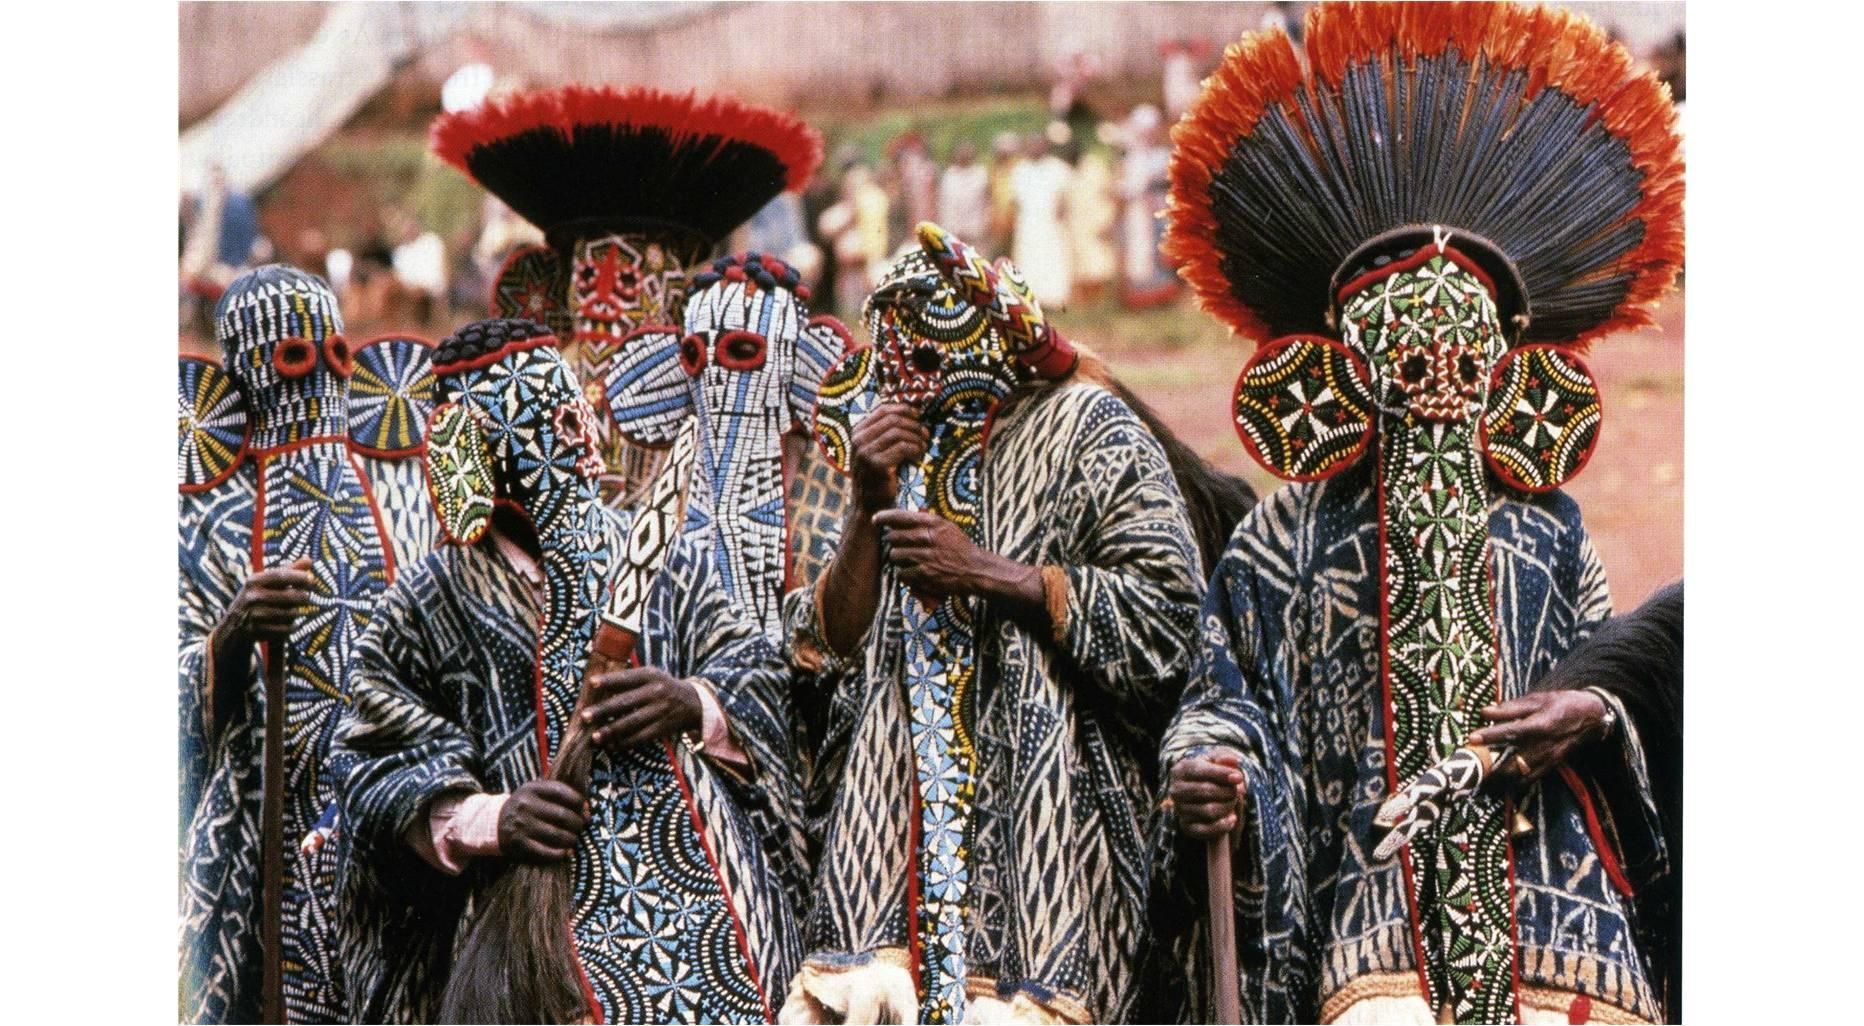 Aka Elephant Mask Bamileke Cameroon Western Grassfields Region C 19th To 20th Century C E Wood Woven Raffia Cl Ap Art History 250 African Art Juju Hat